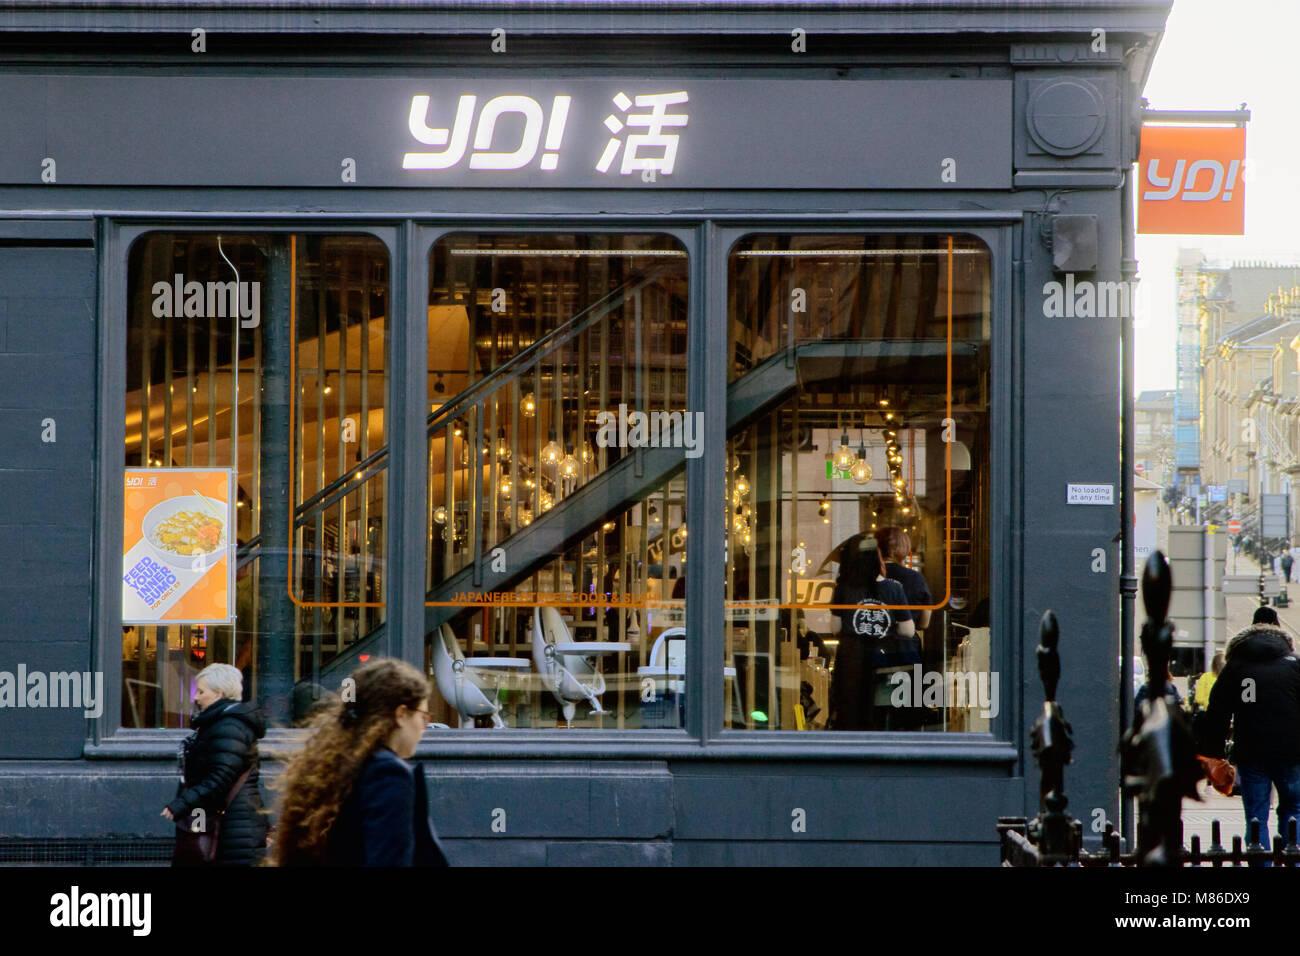 YO! Sushi, West George Street, Glasgow, Scotland - Stock Image